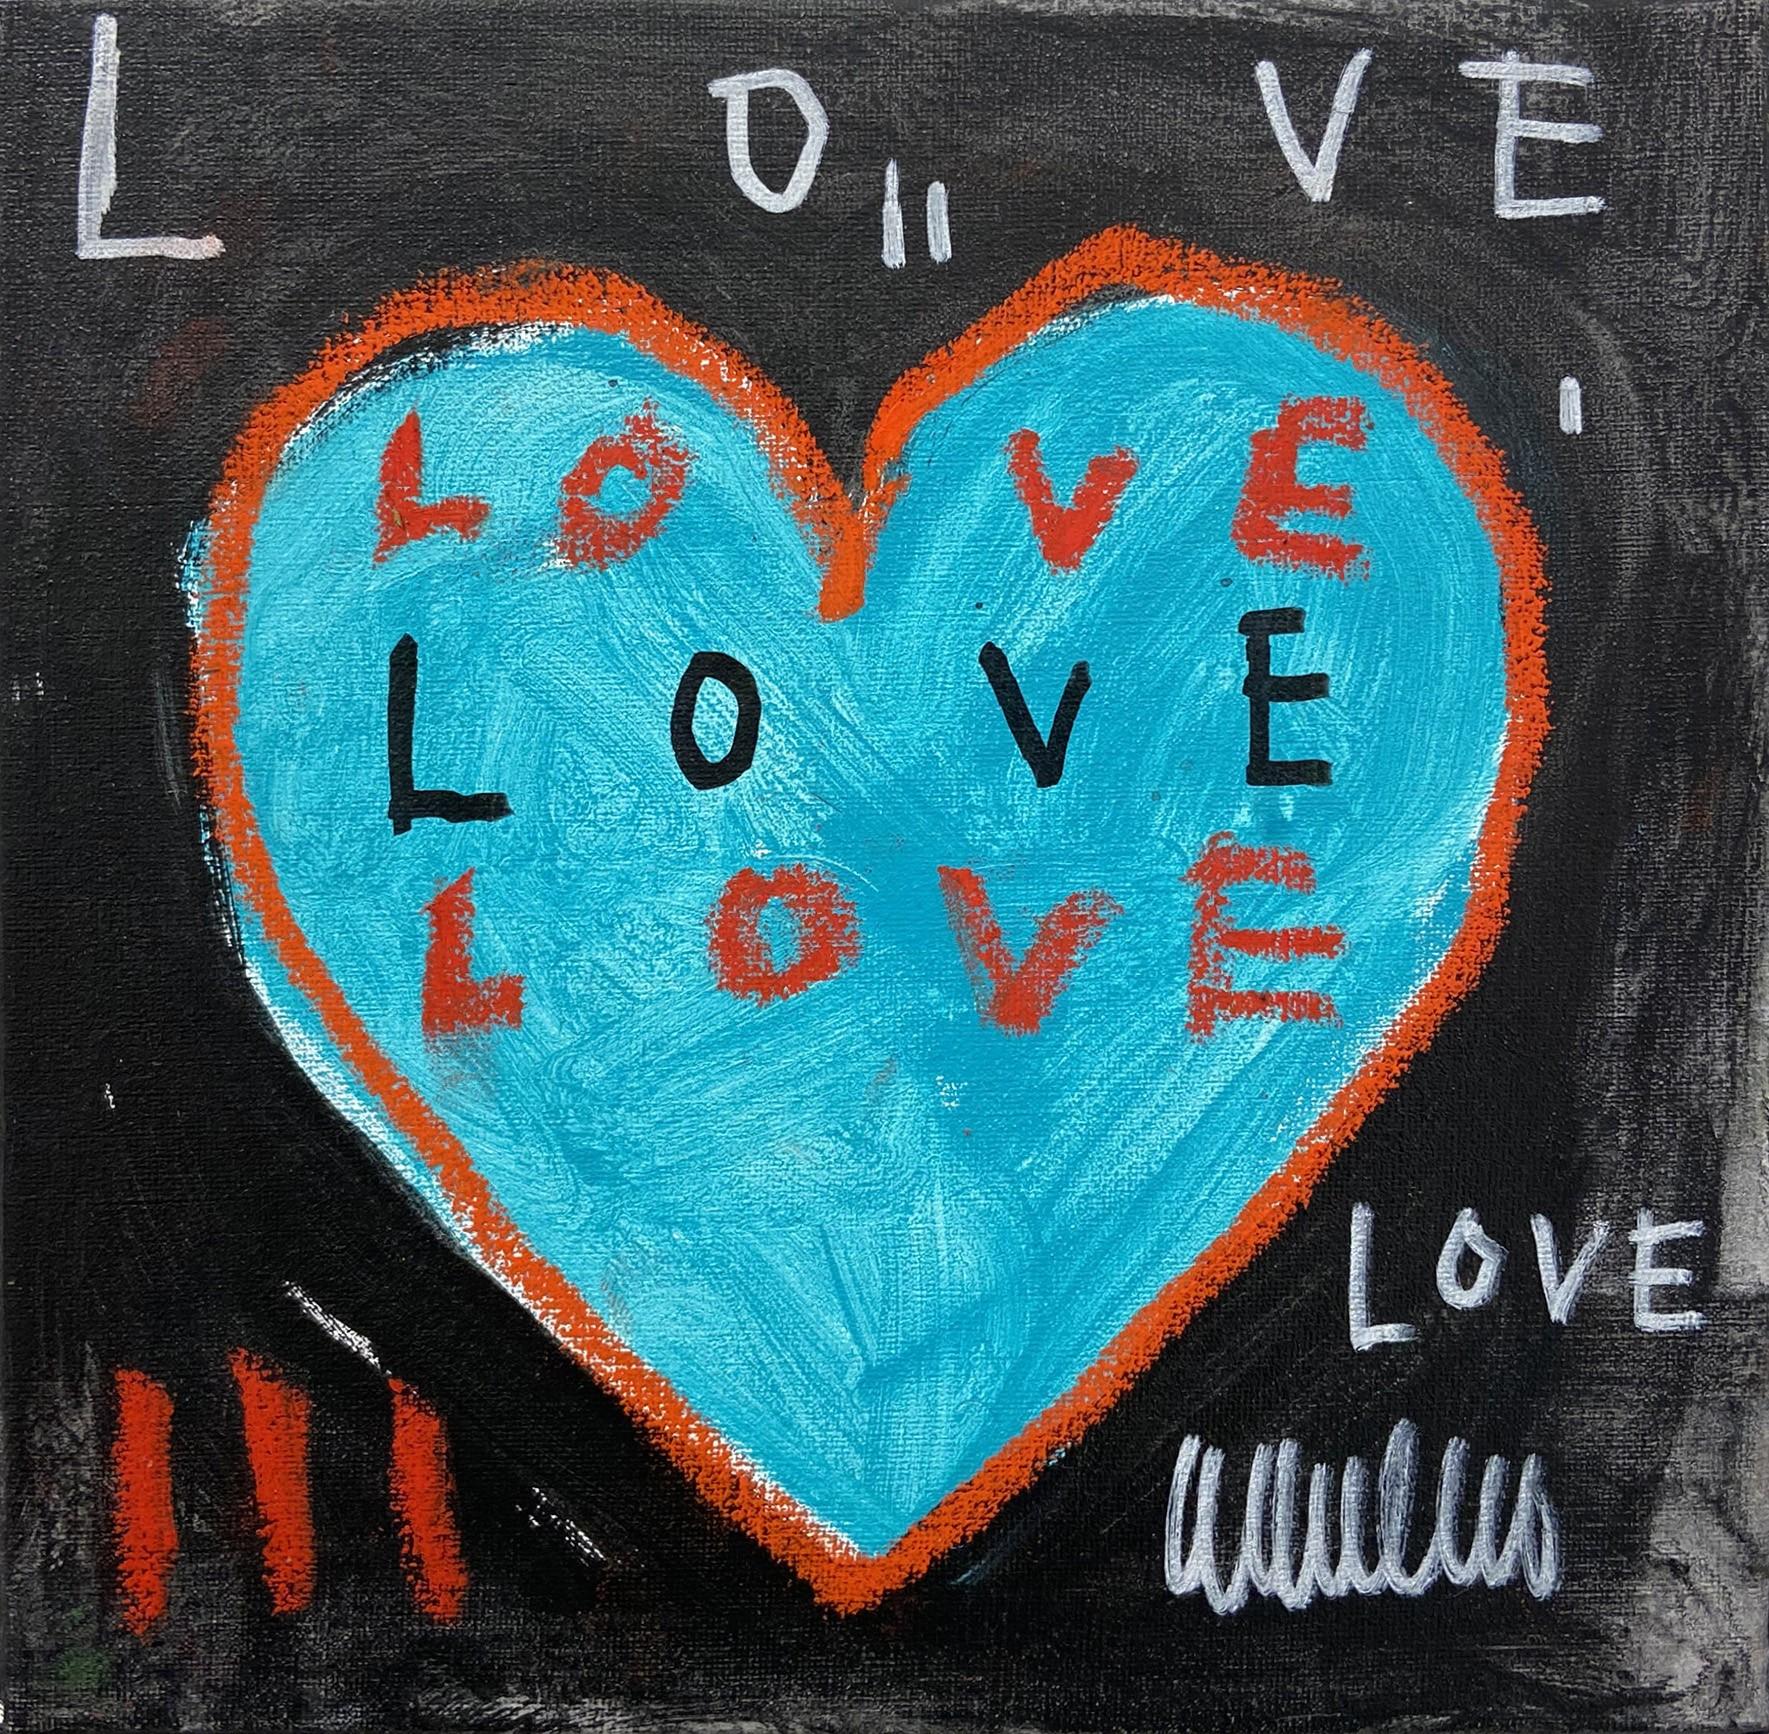 Troy Henriksen - Love love love